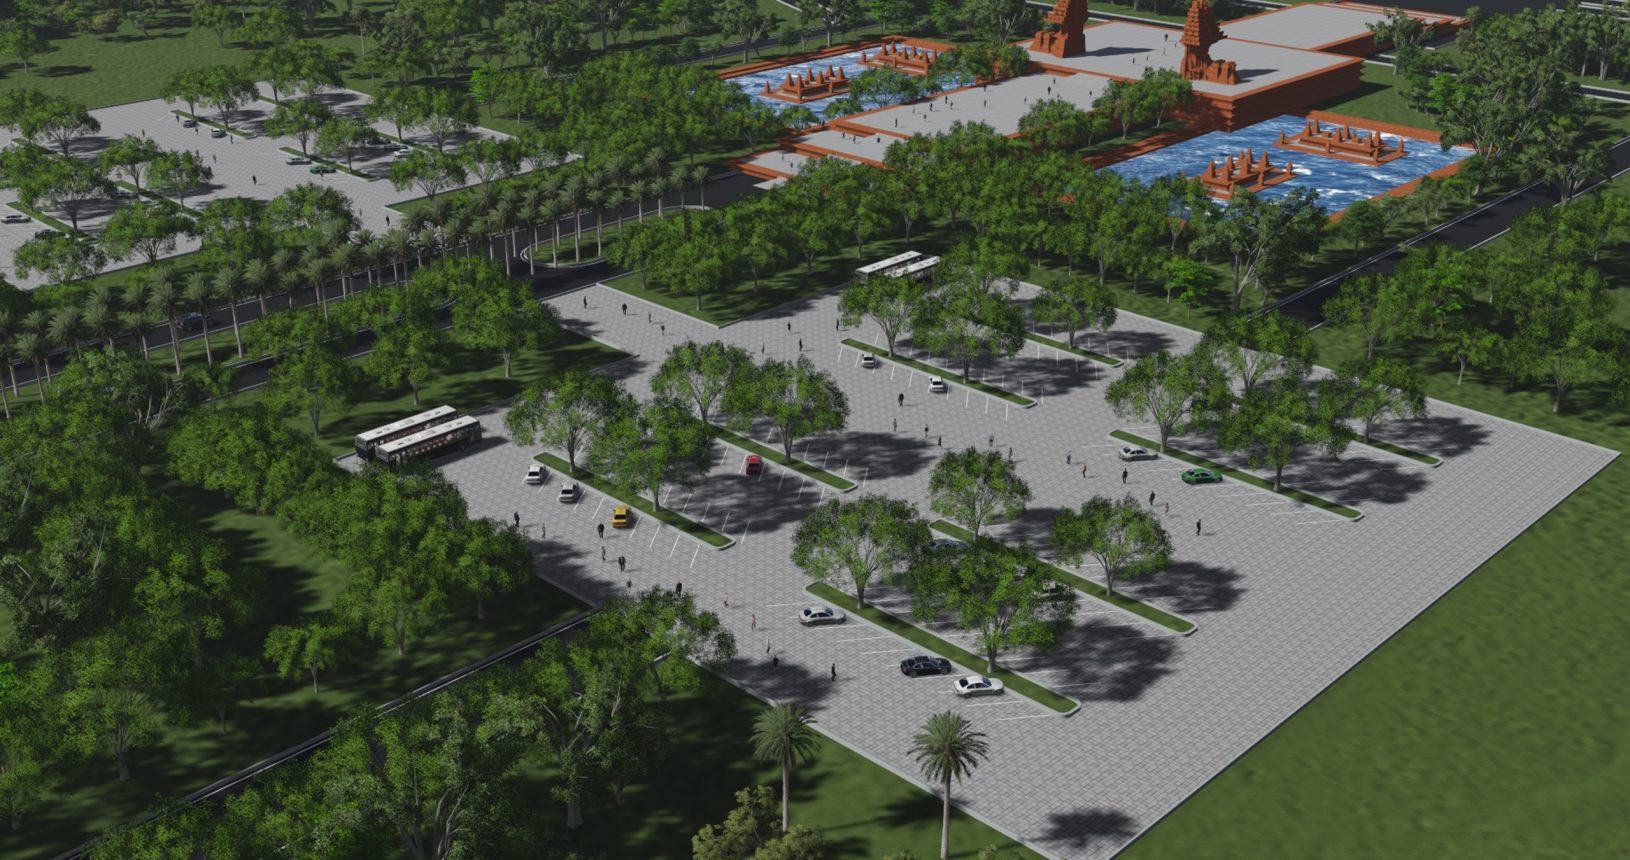 area-parkir-utama-taman-perdamaian-dunia